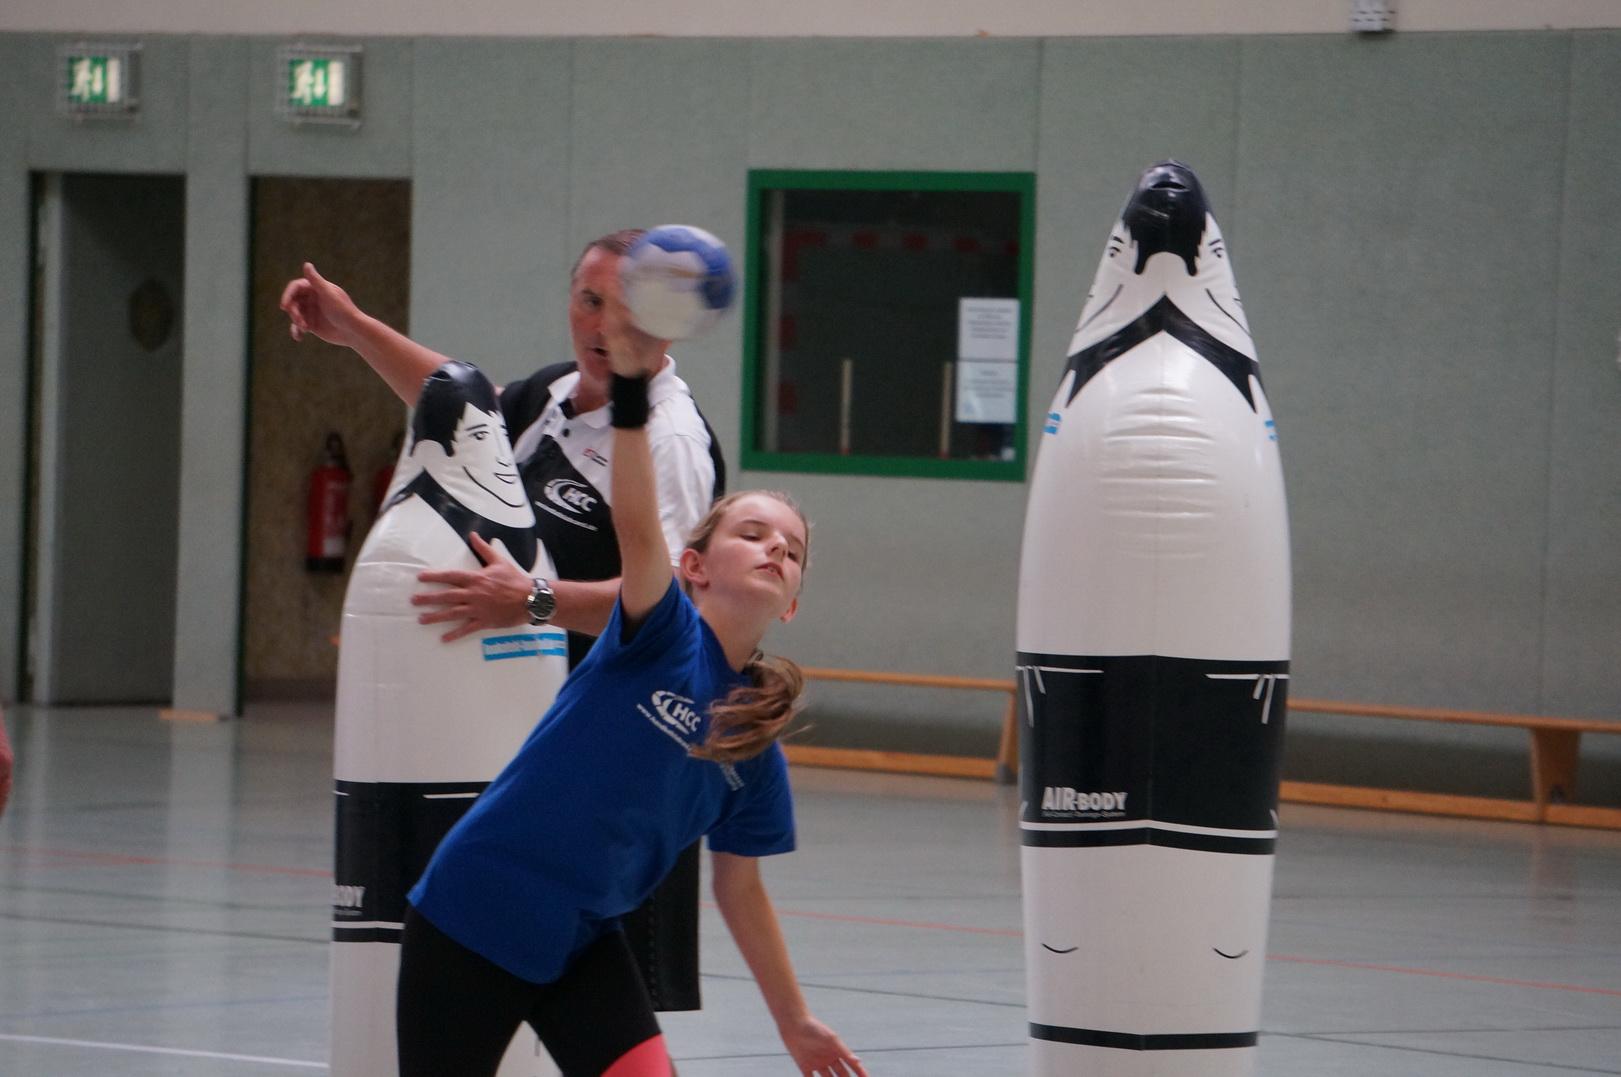 201808_Handballcamp_SDH_MG_211w